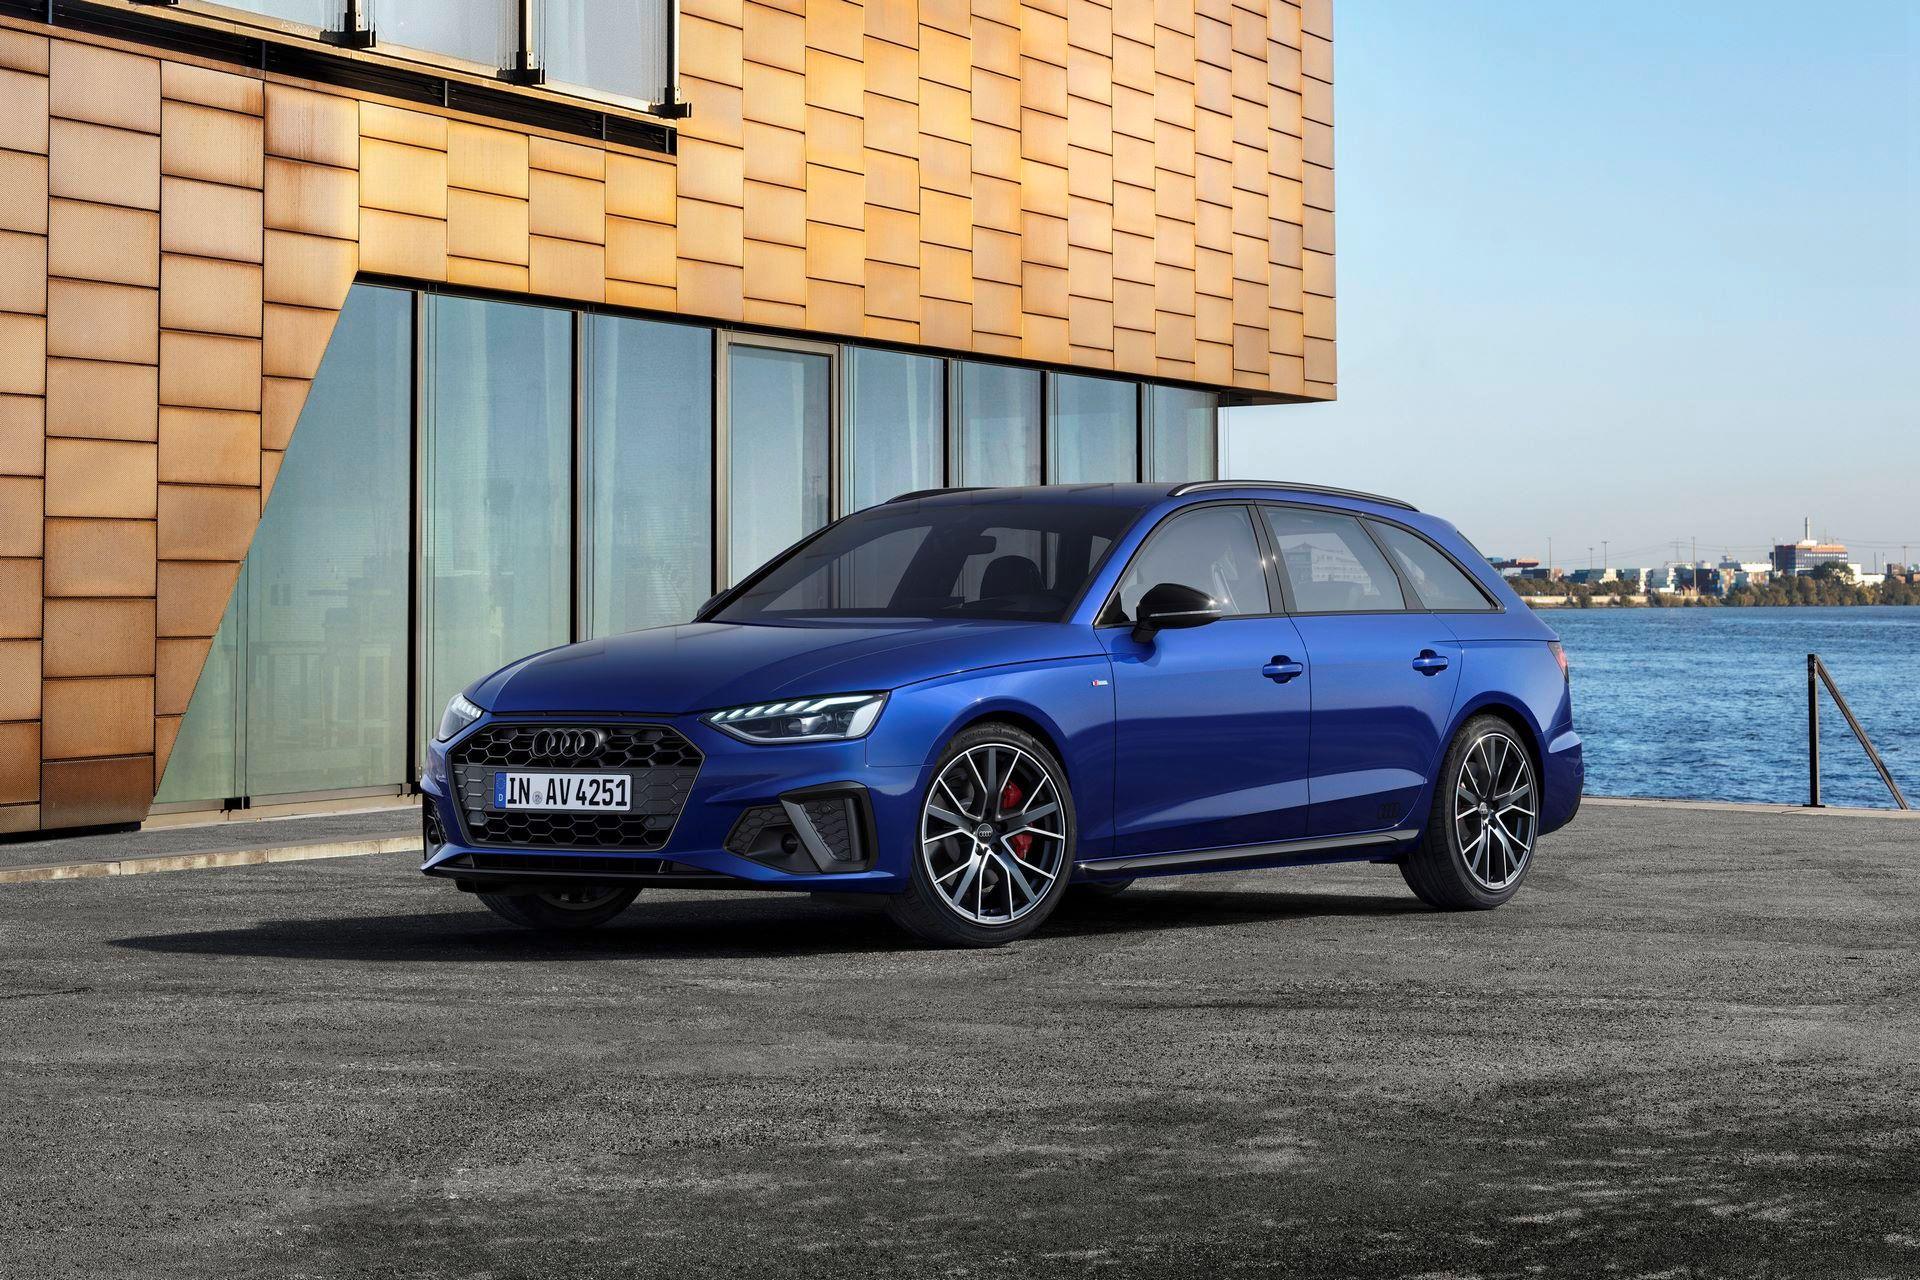 Audi-A4-A5-Q7-Q8-Competition-And-Competition-Plus-Trims-51